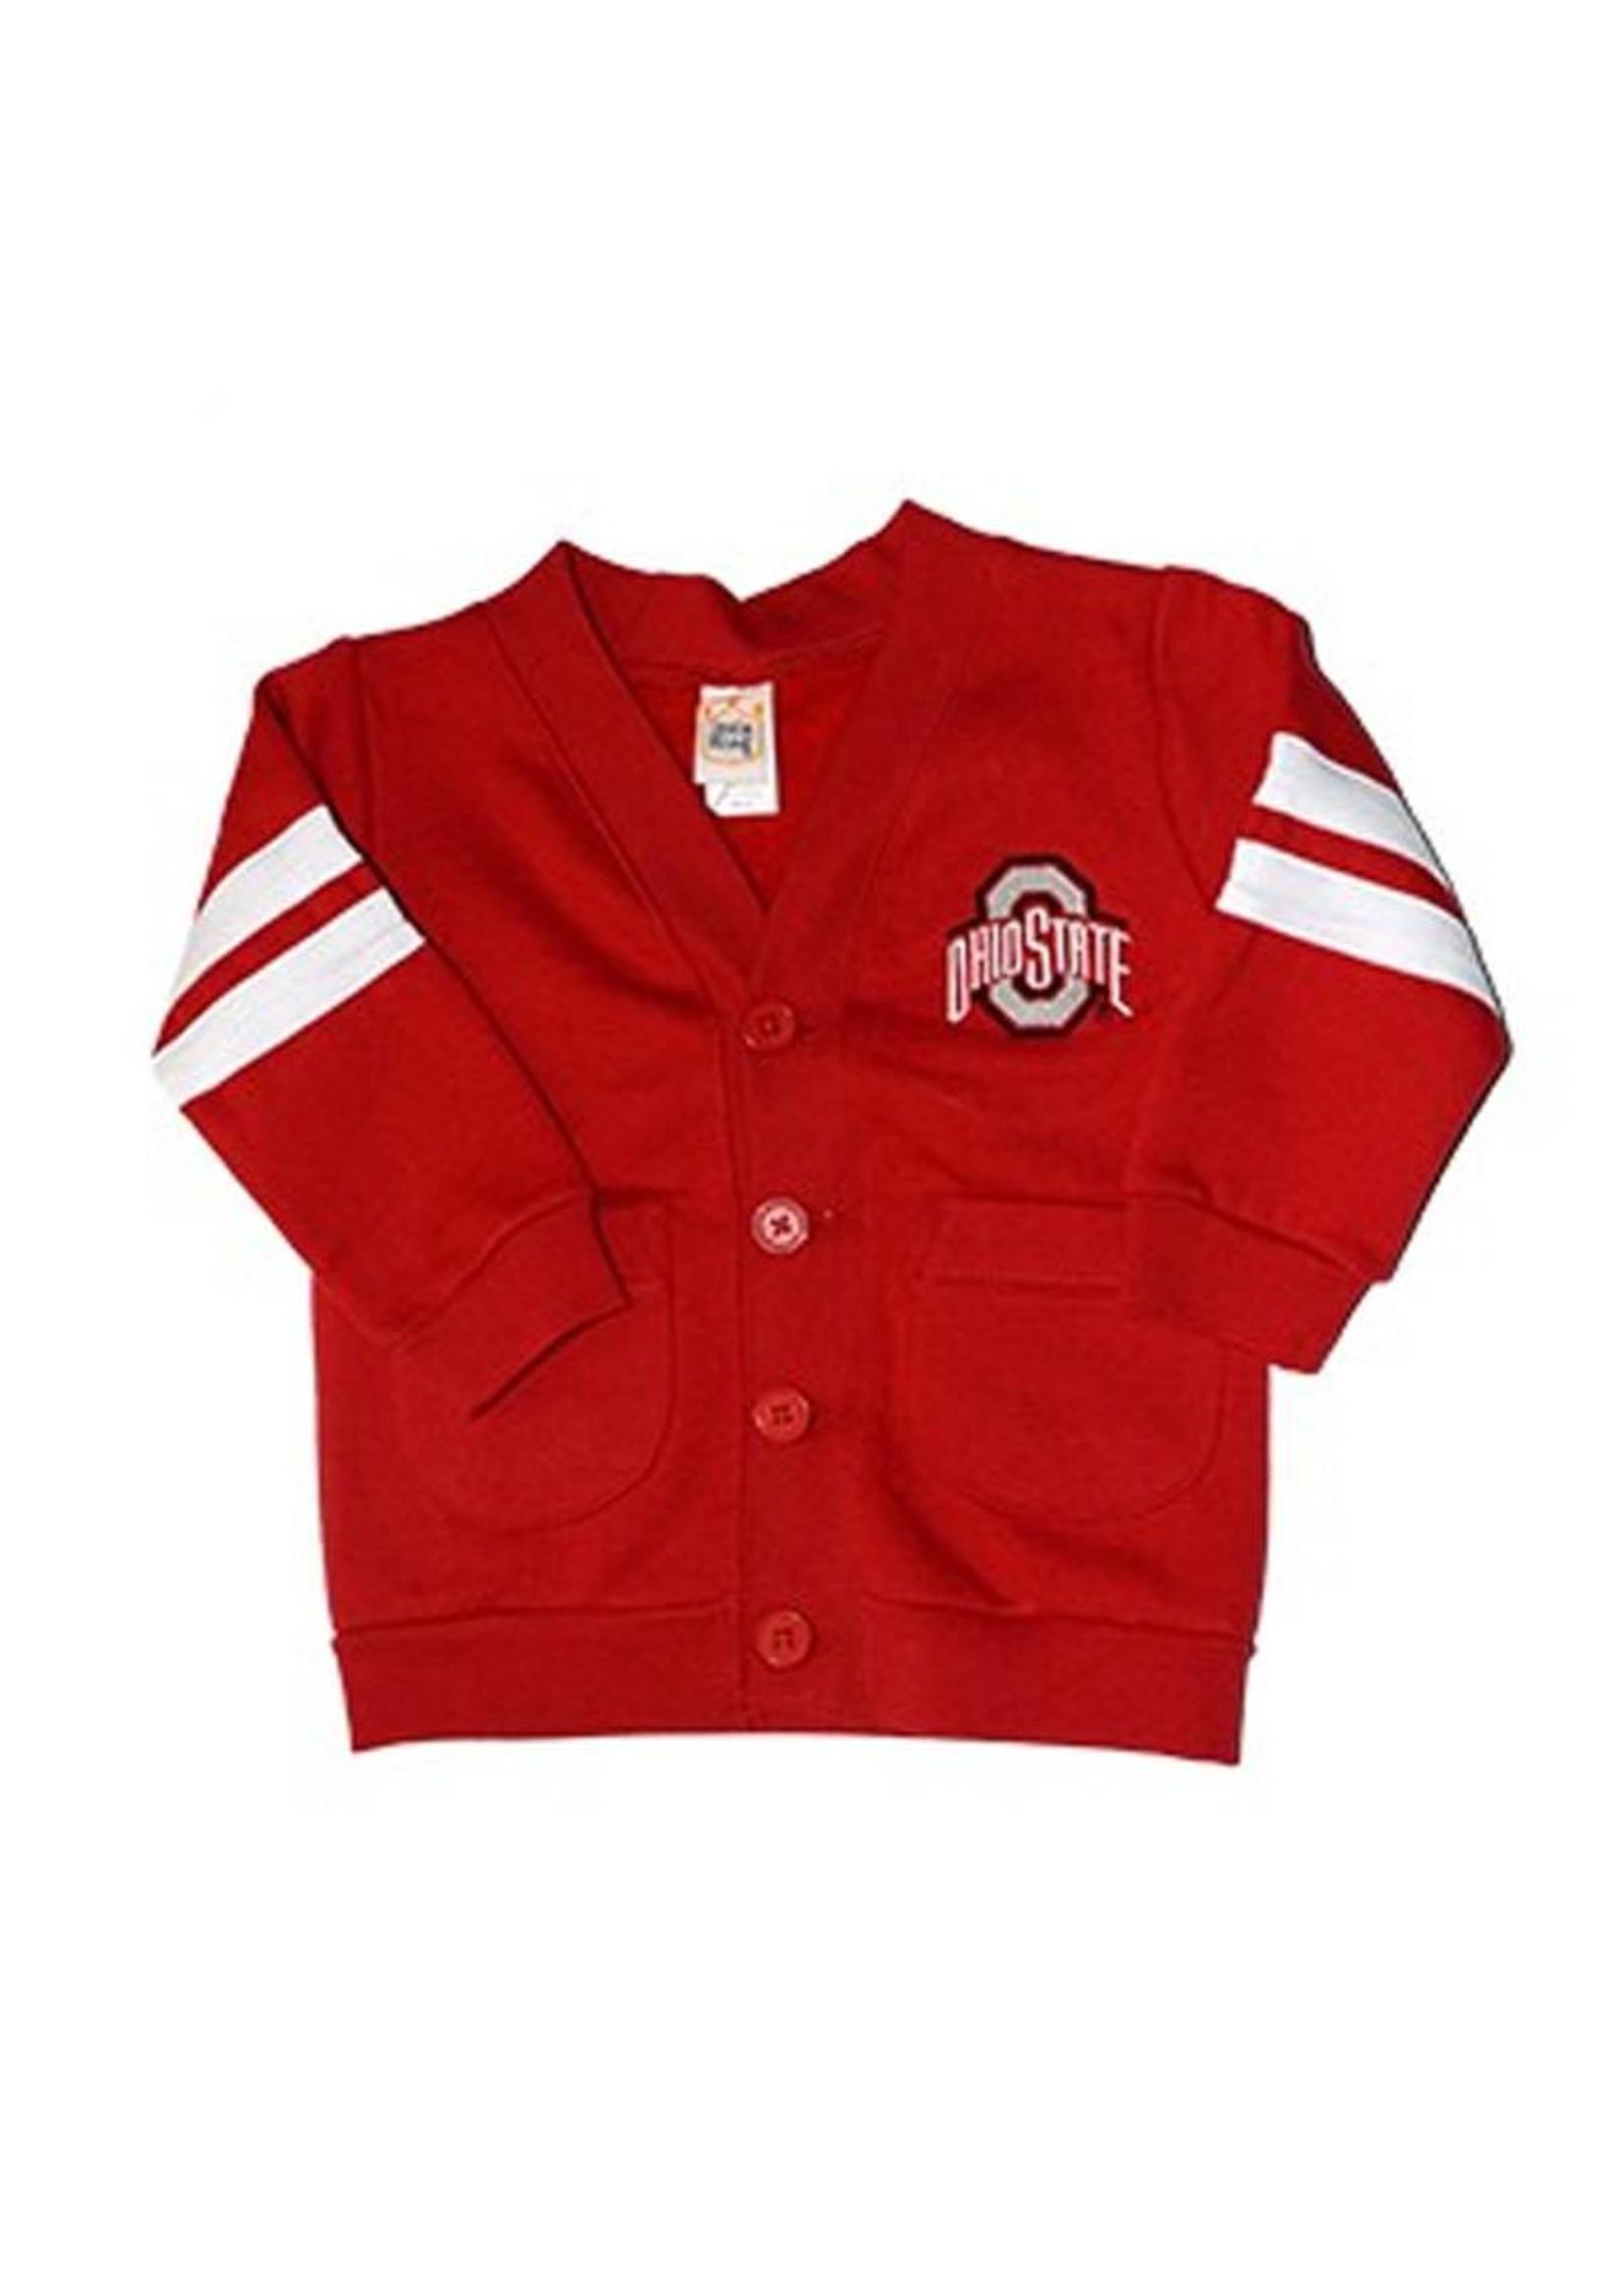 Ohio State University Toddler Striped Cardigan